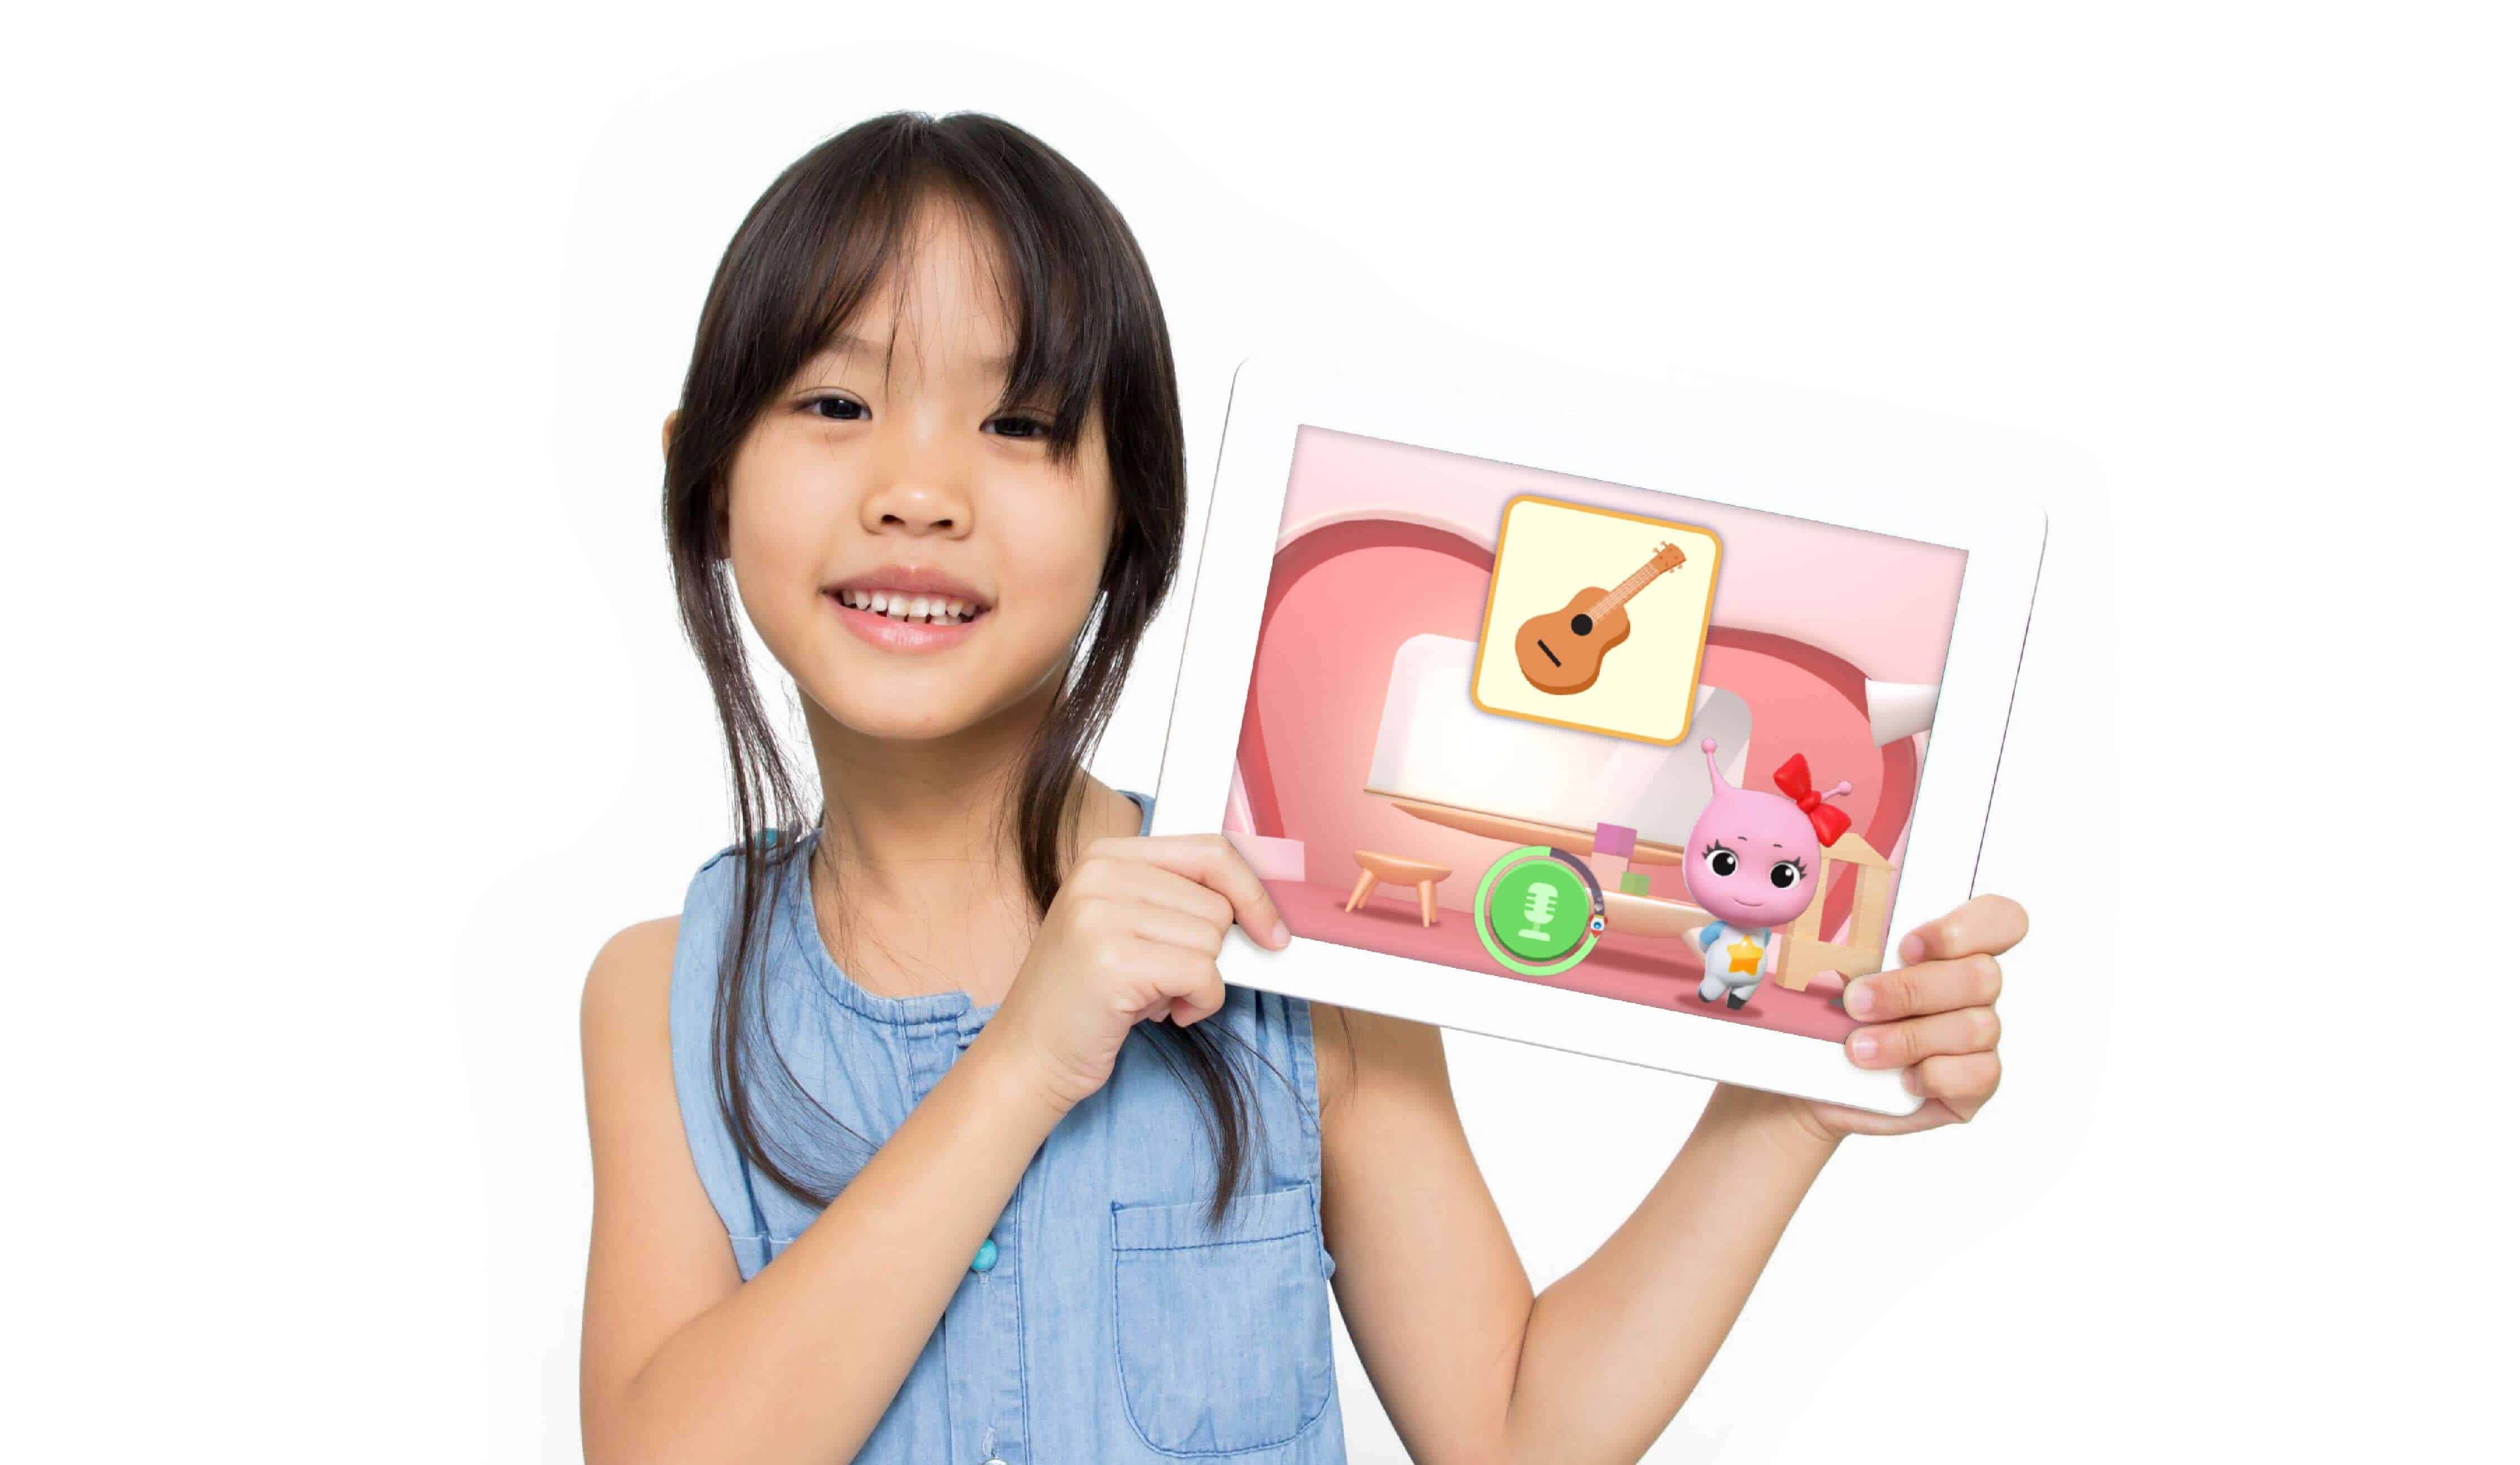 , STREAM Education กับการเรียนภาษาอังกฤษผ่านแอปสำหรับเด็ก